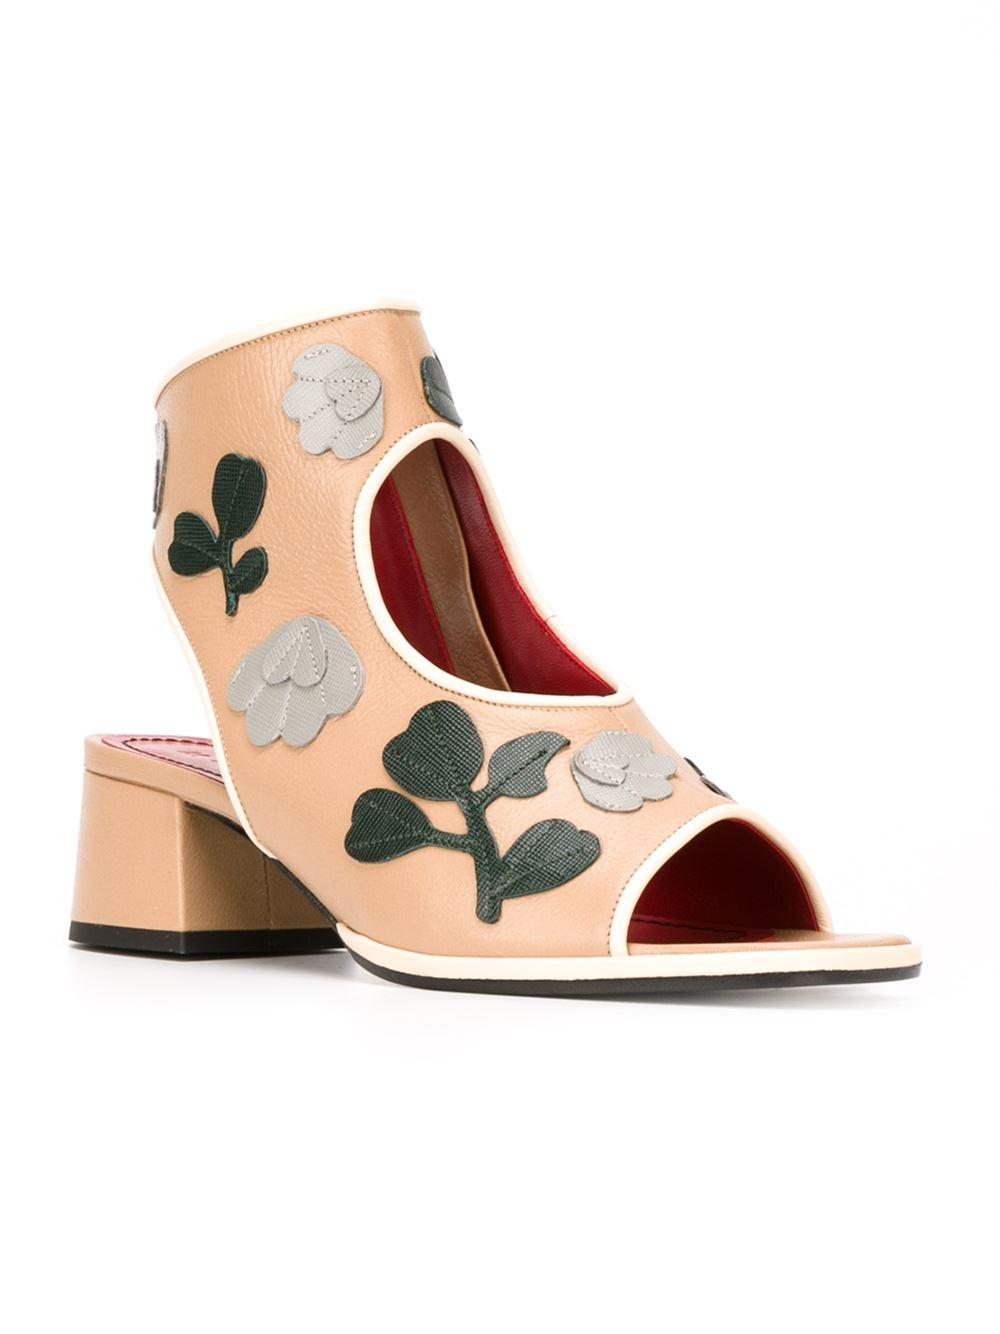 floral applique sandals - Nude & Neutrals Marni MszpB